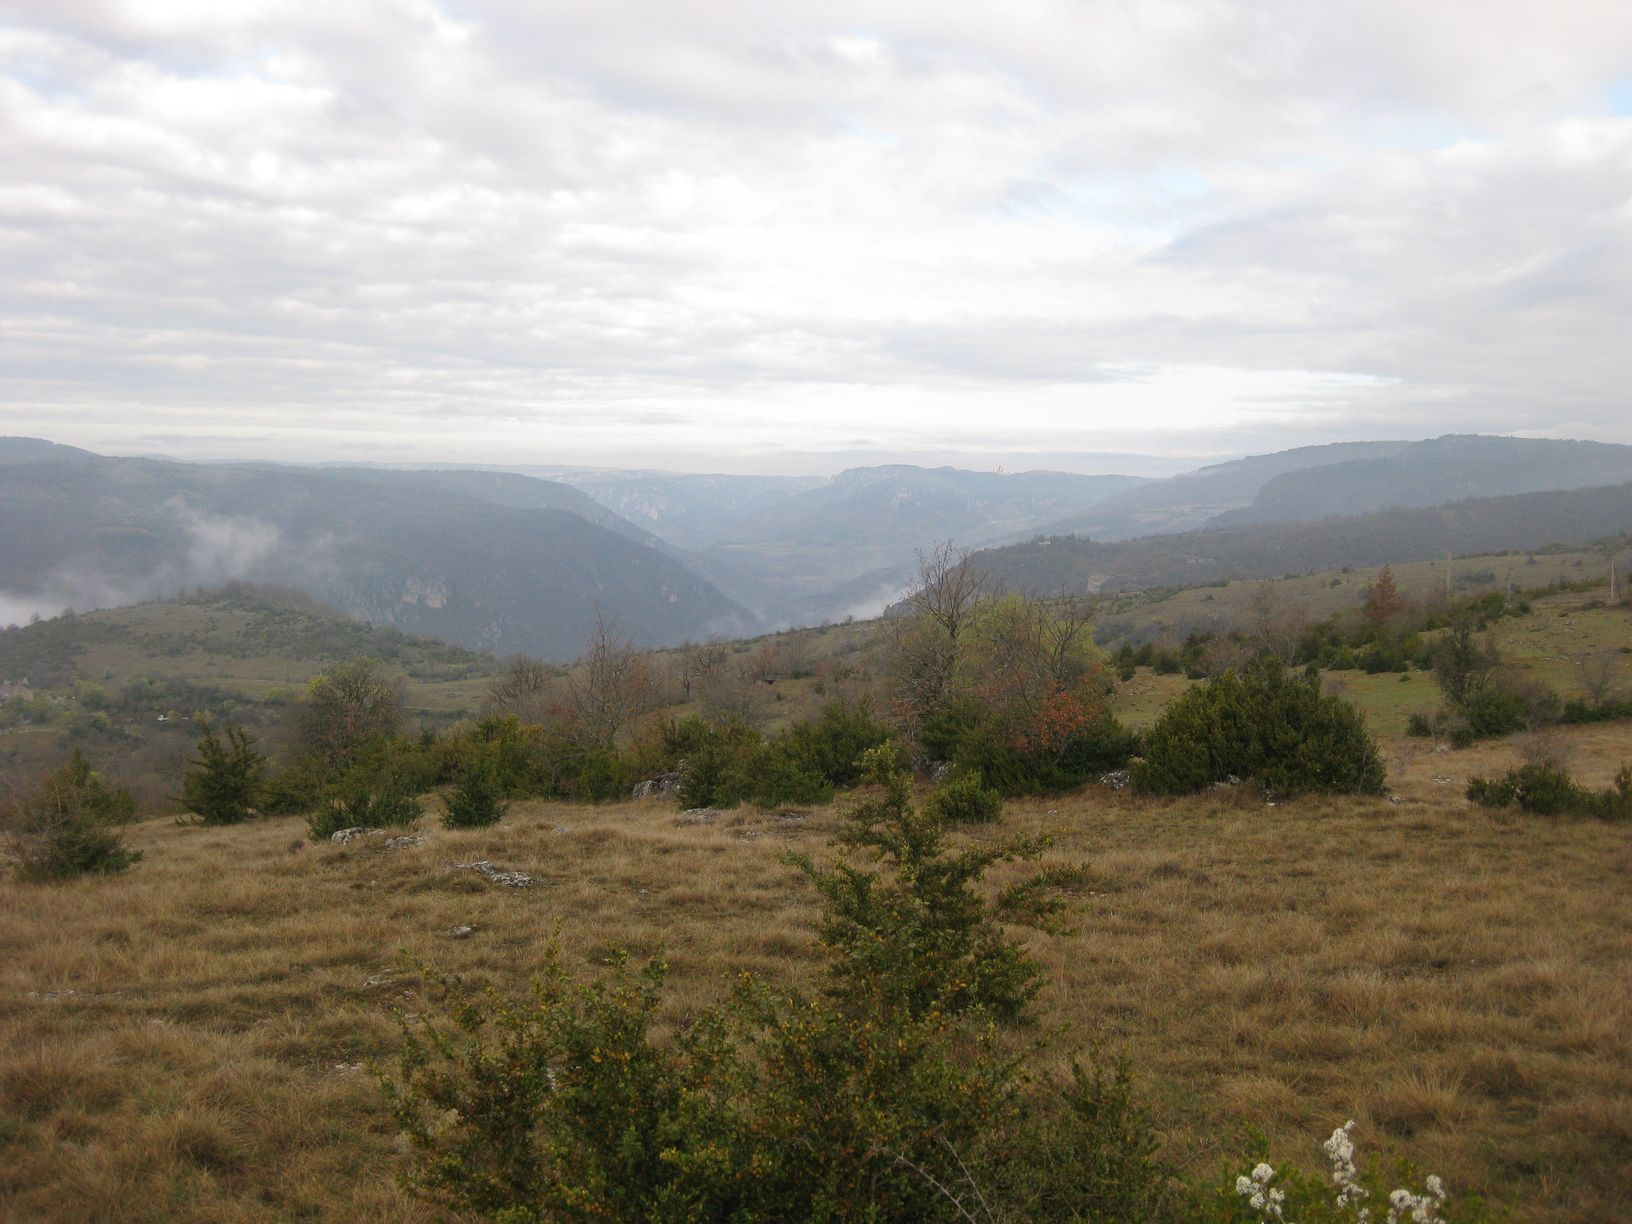 http://www.corambe.com/caminarello/IMG_6197.JPG